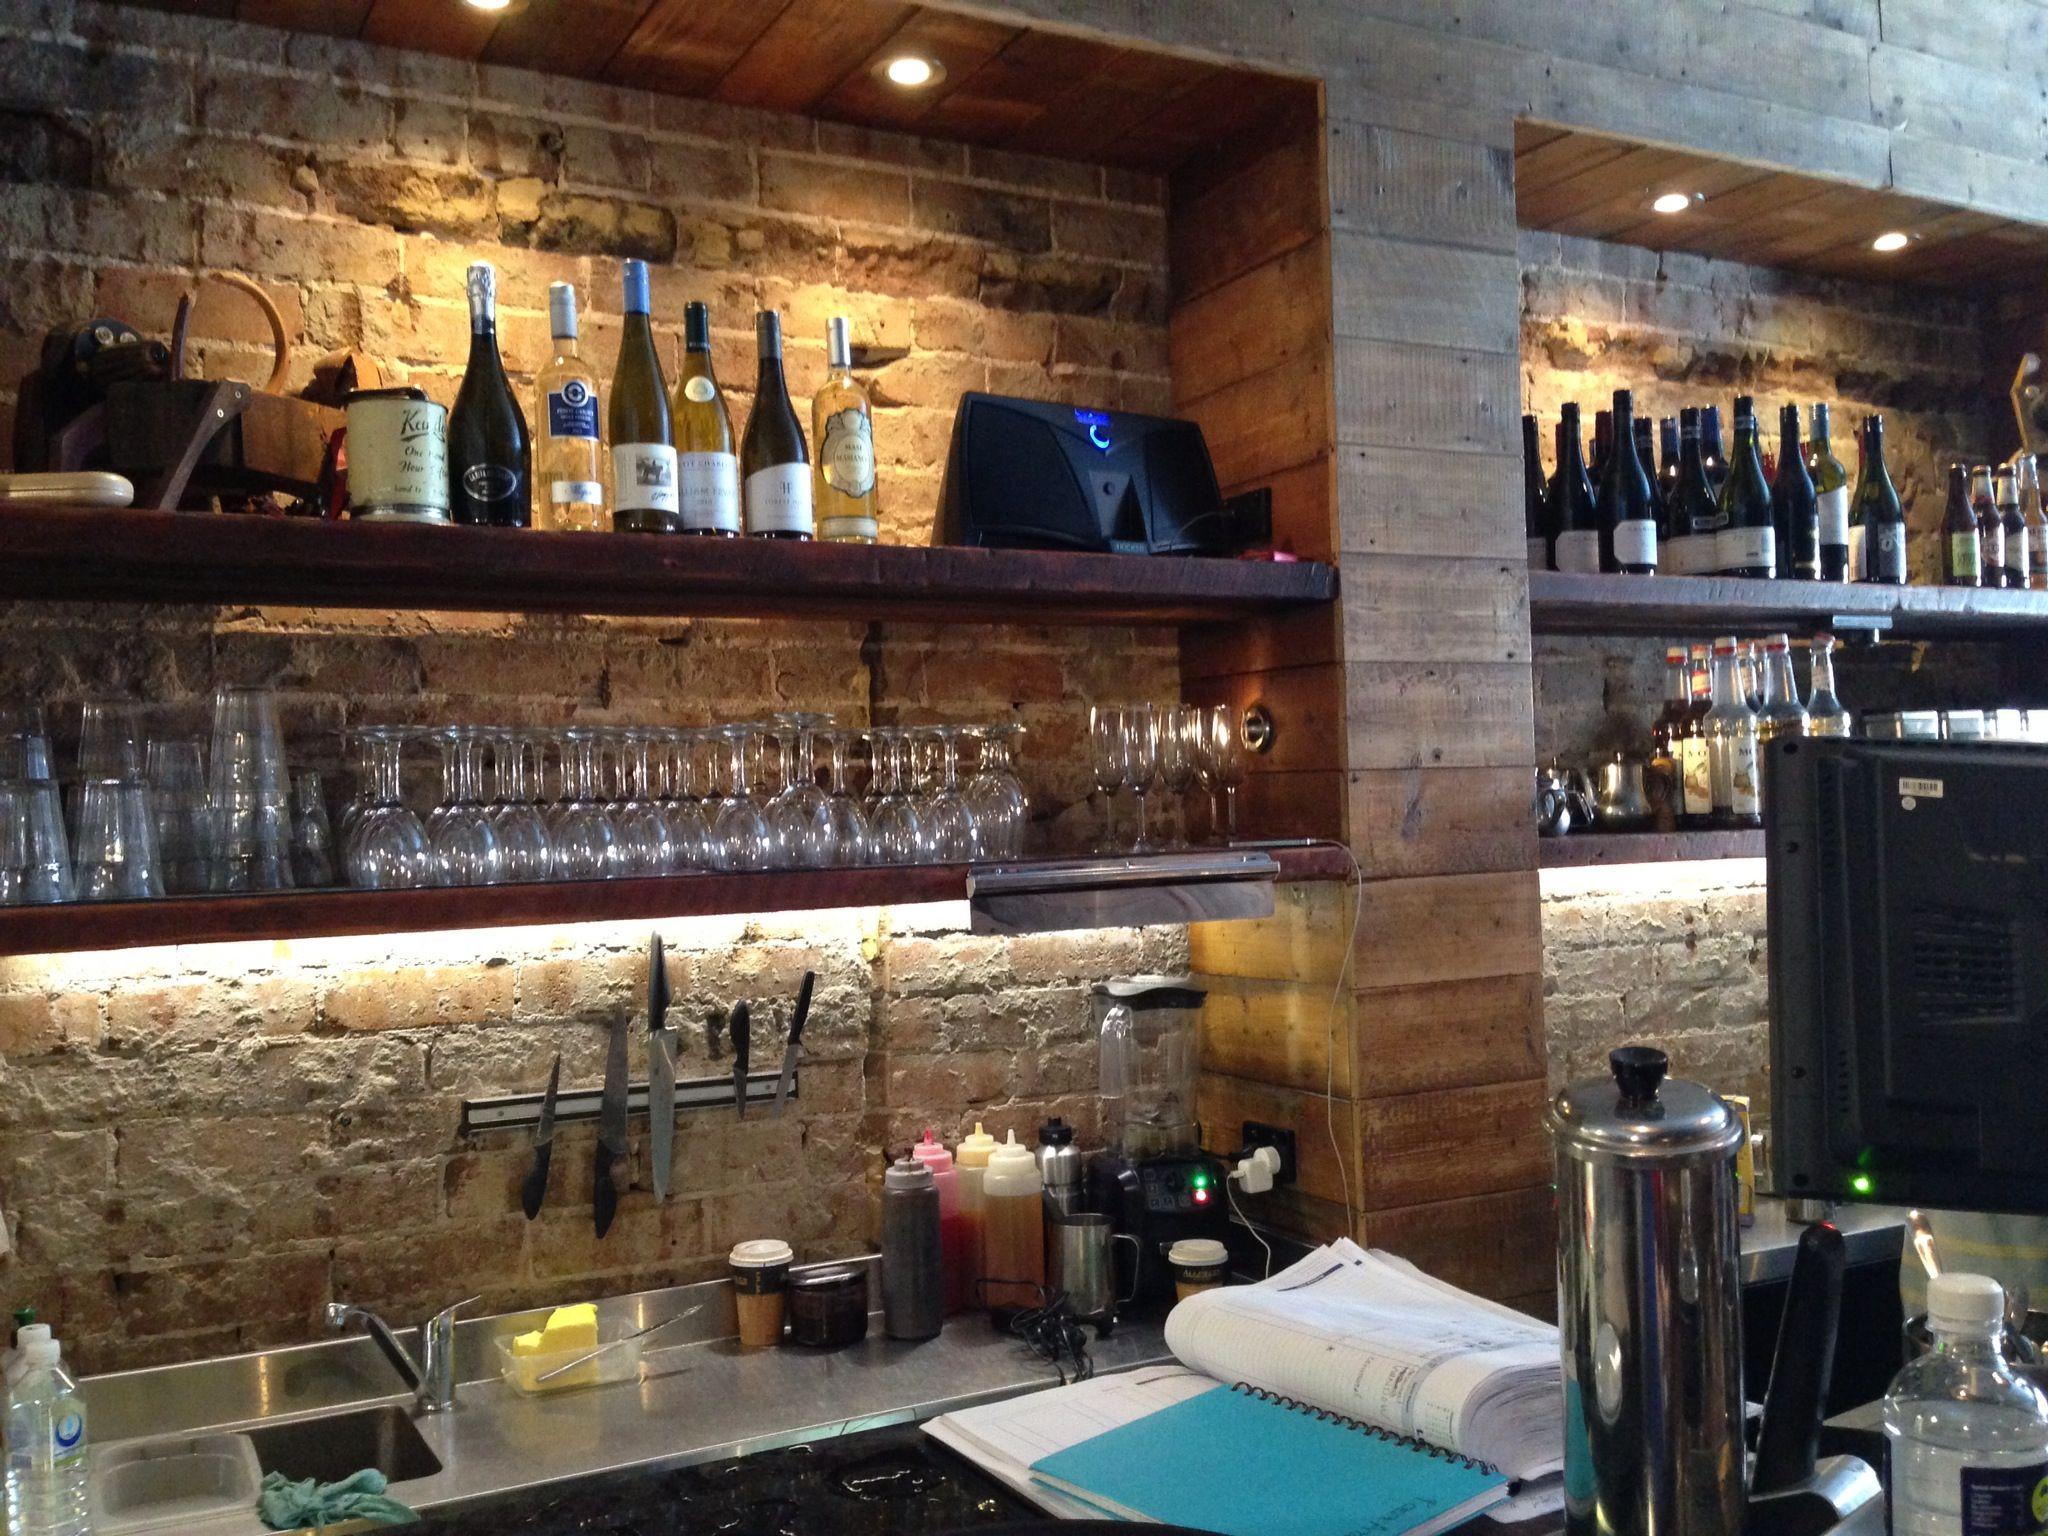 Wood and brick bar back | New Home | Pinterest | Bricks, Bar and Woods